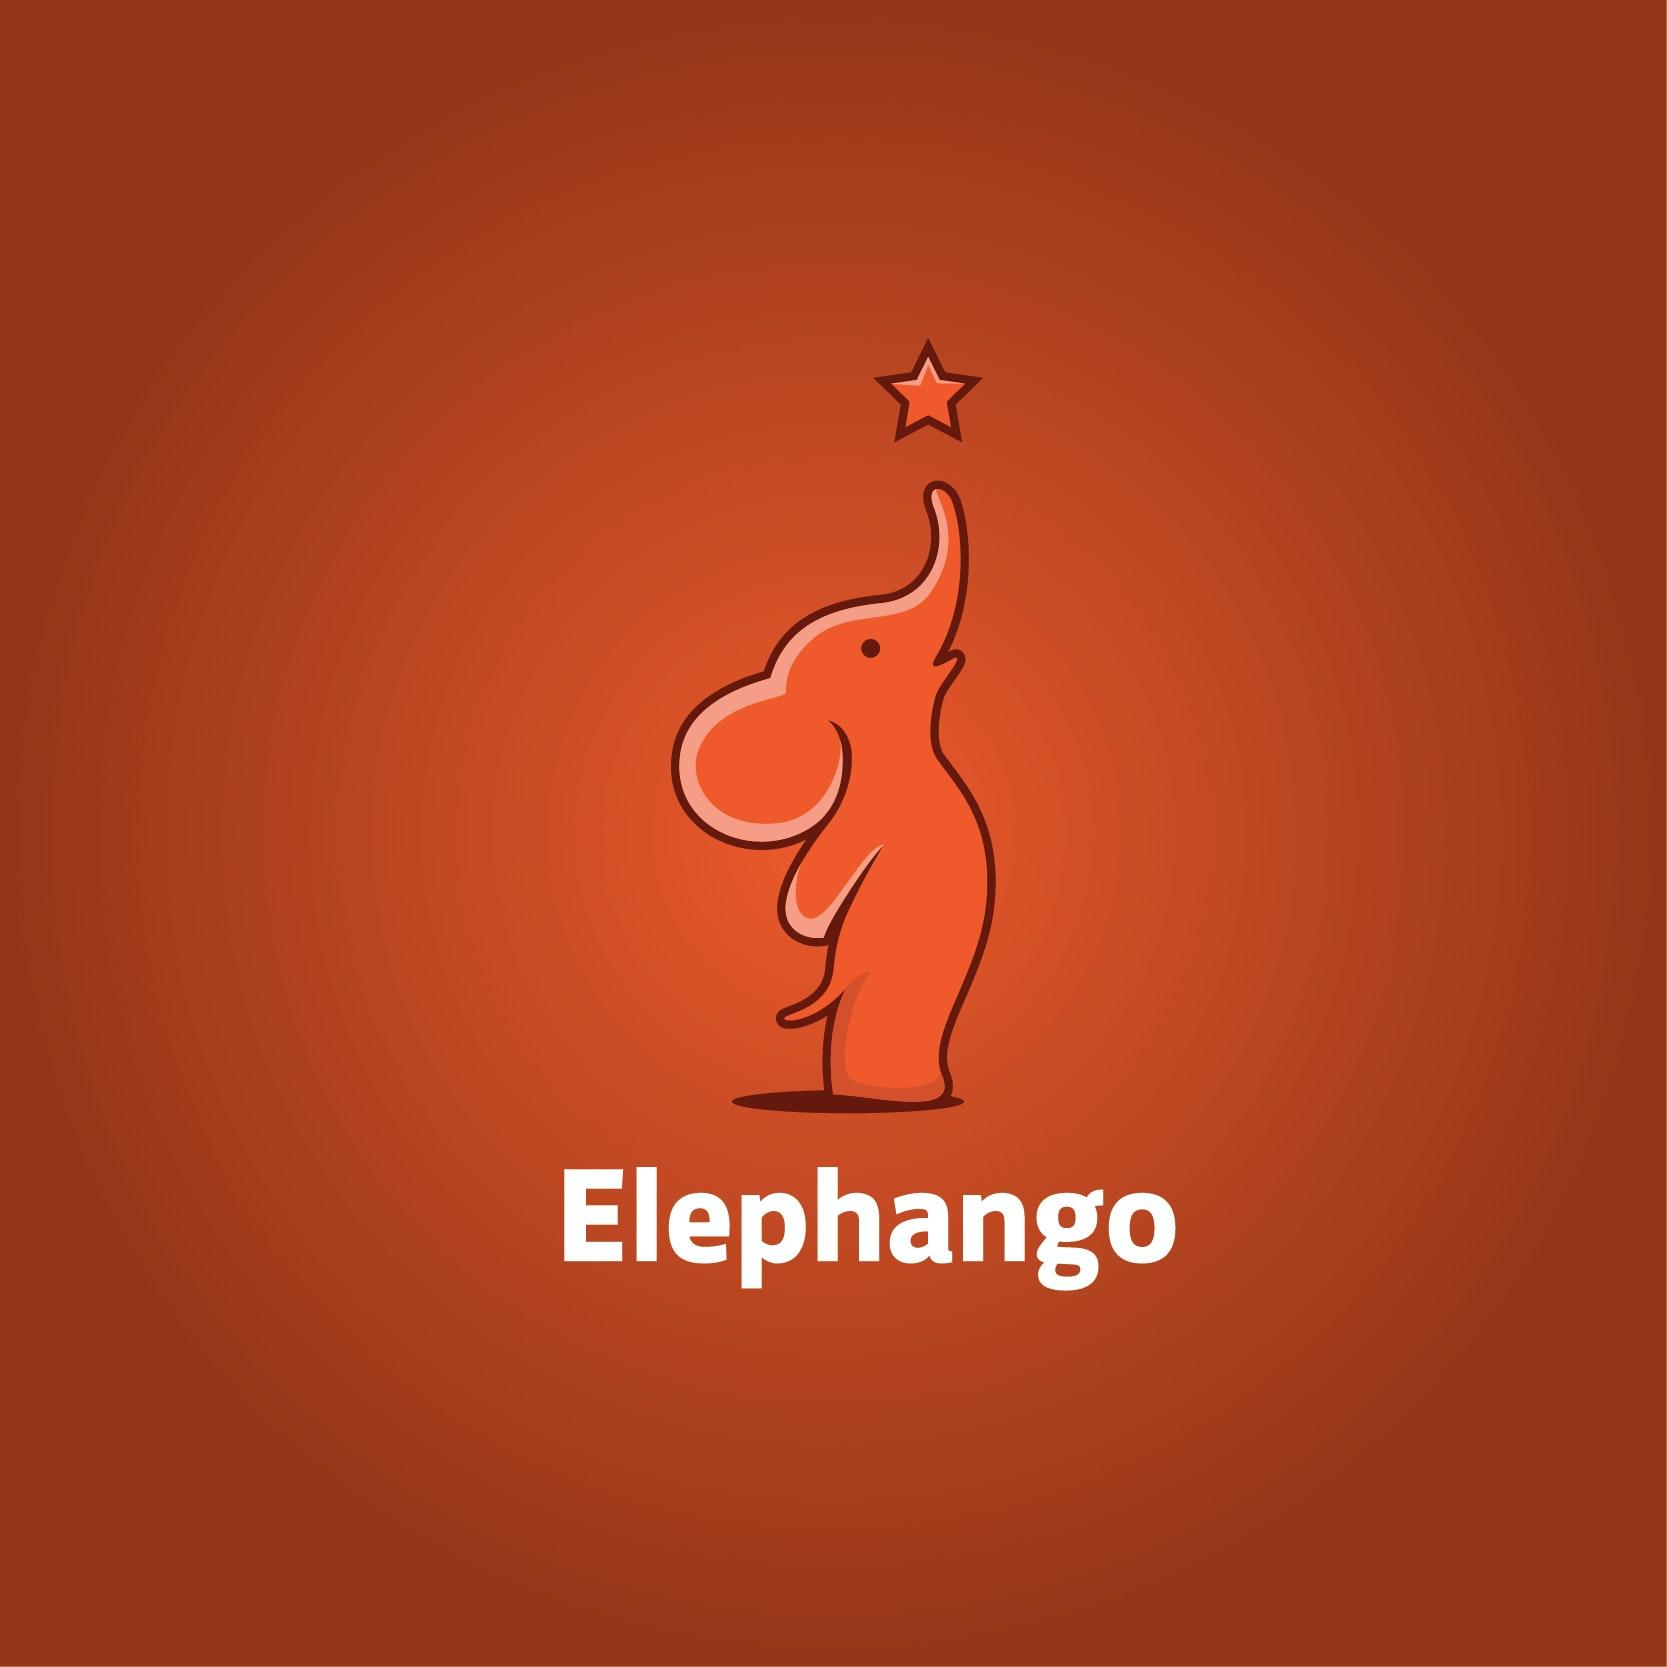 Animal mascot logo design